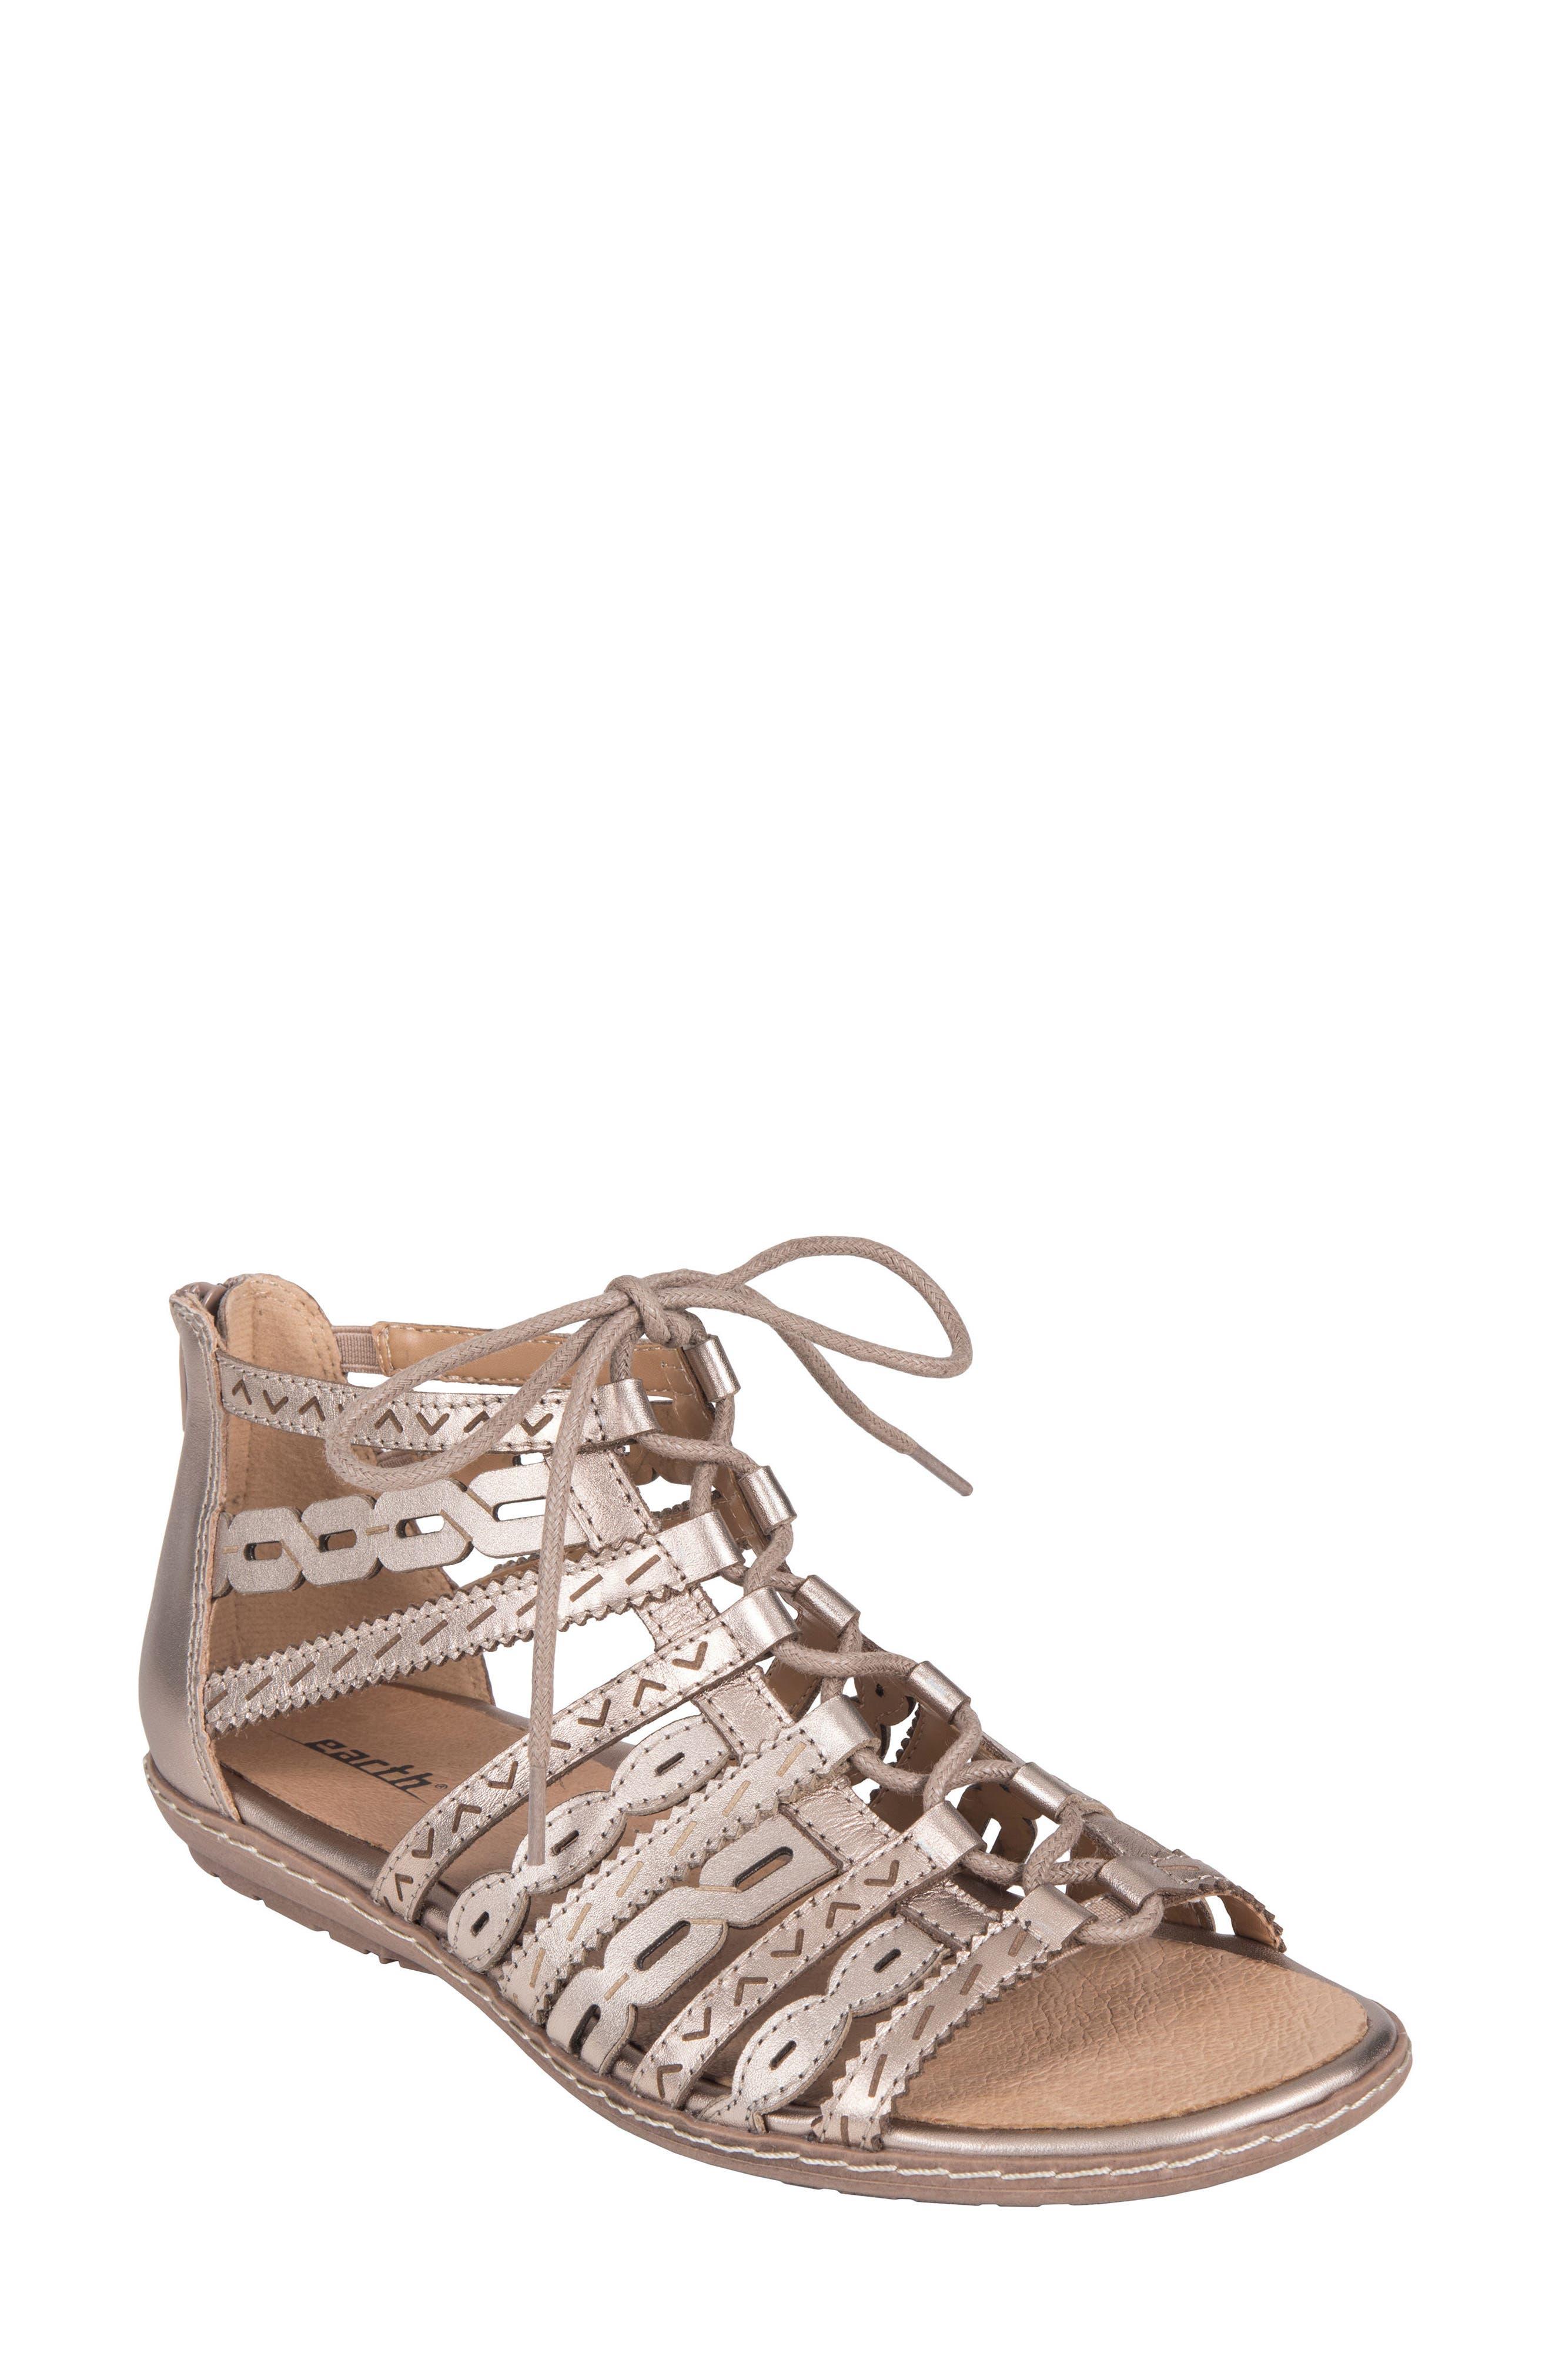 Tidal Mid Top Ghillie Sandal,                         Main,                         color, Titanium Leather